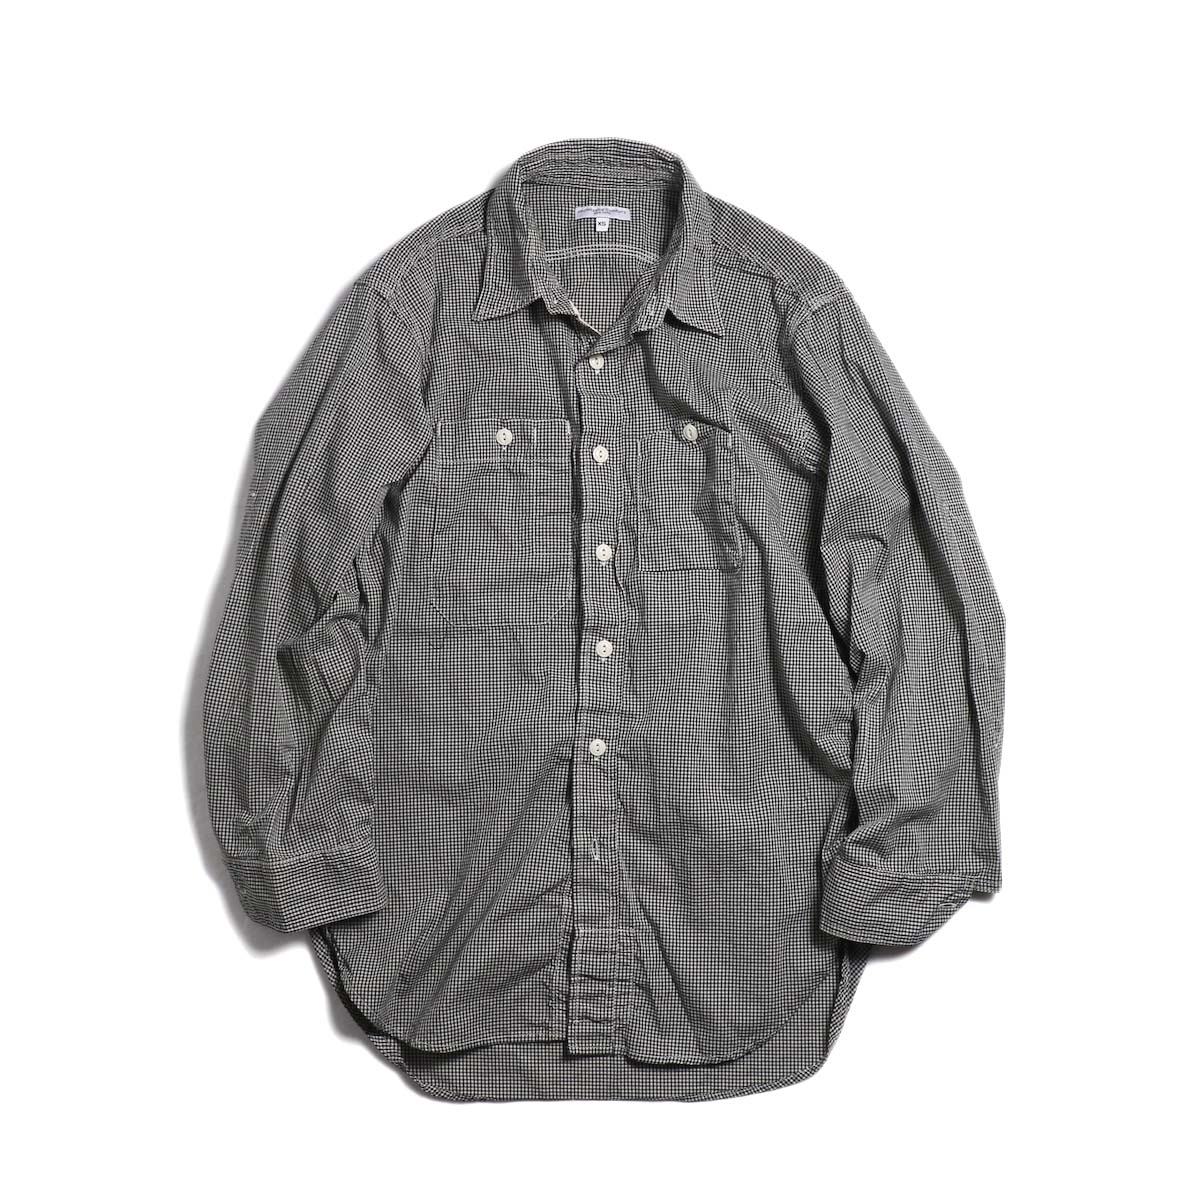 ENGINEERED GARMENTS / Work Shirt -Small Gingham Broadcloth (Dk.Navy)